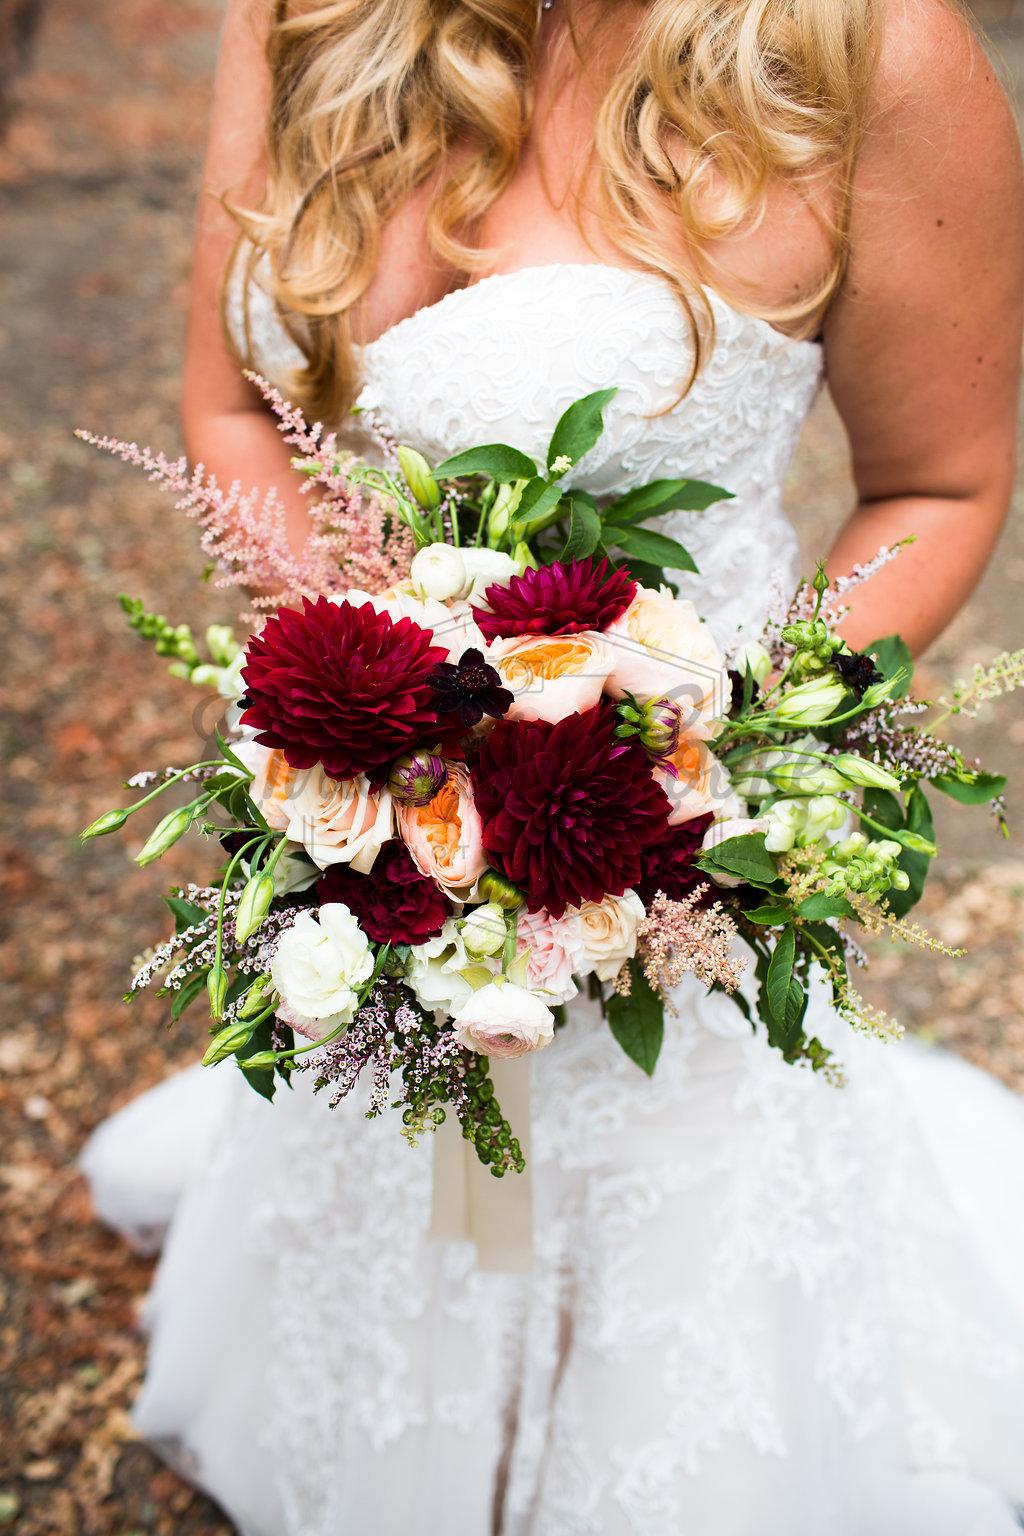 Shelby-Fivella-Wedding-0135.jpg